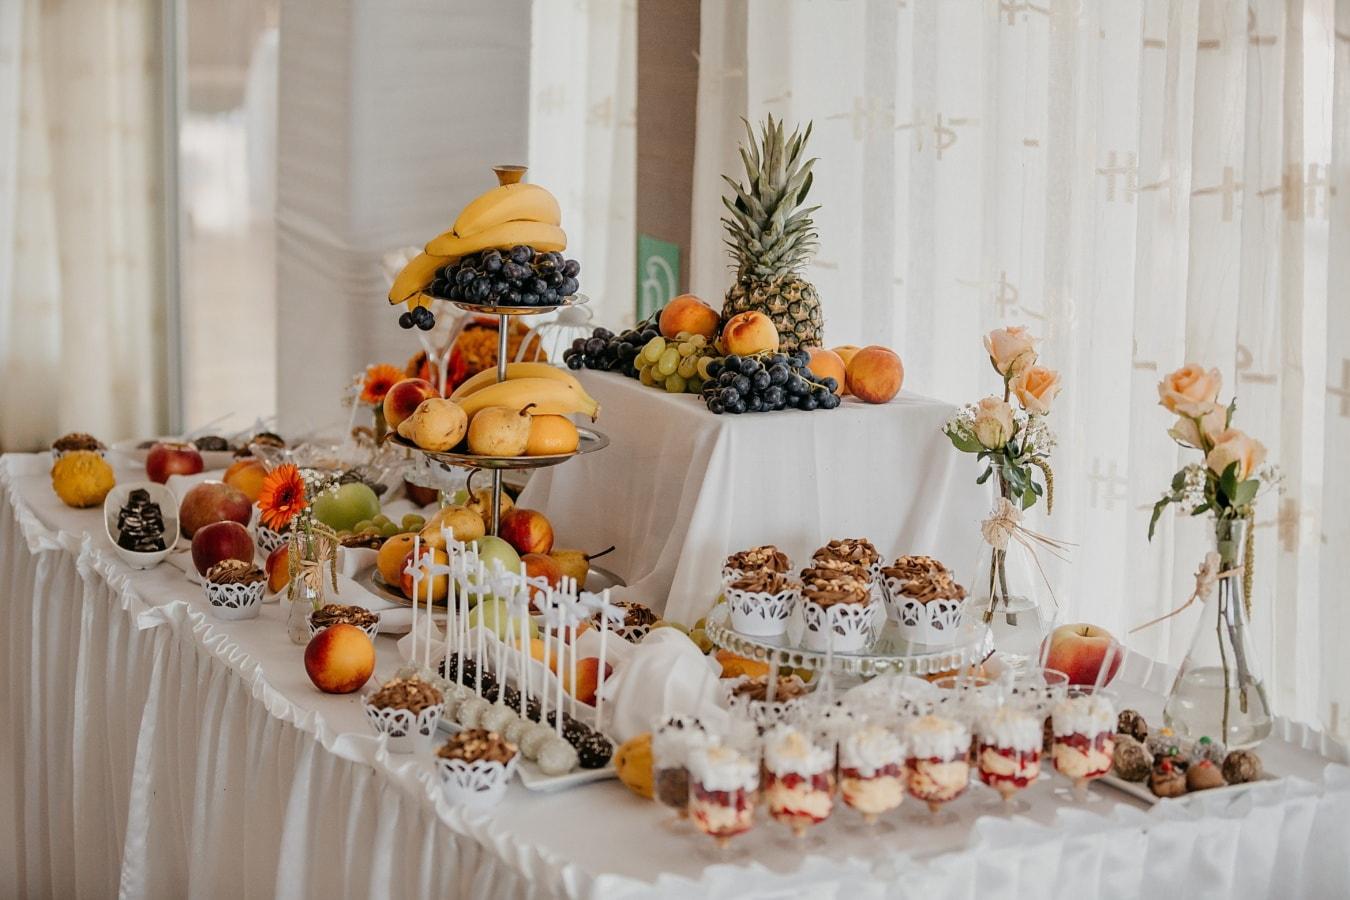 deserts, fruit, food, banquet, cupcake, fancy, decoration, indoors, luxury, leaf